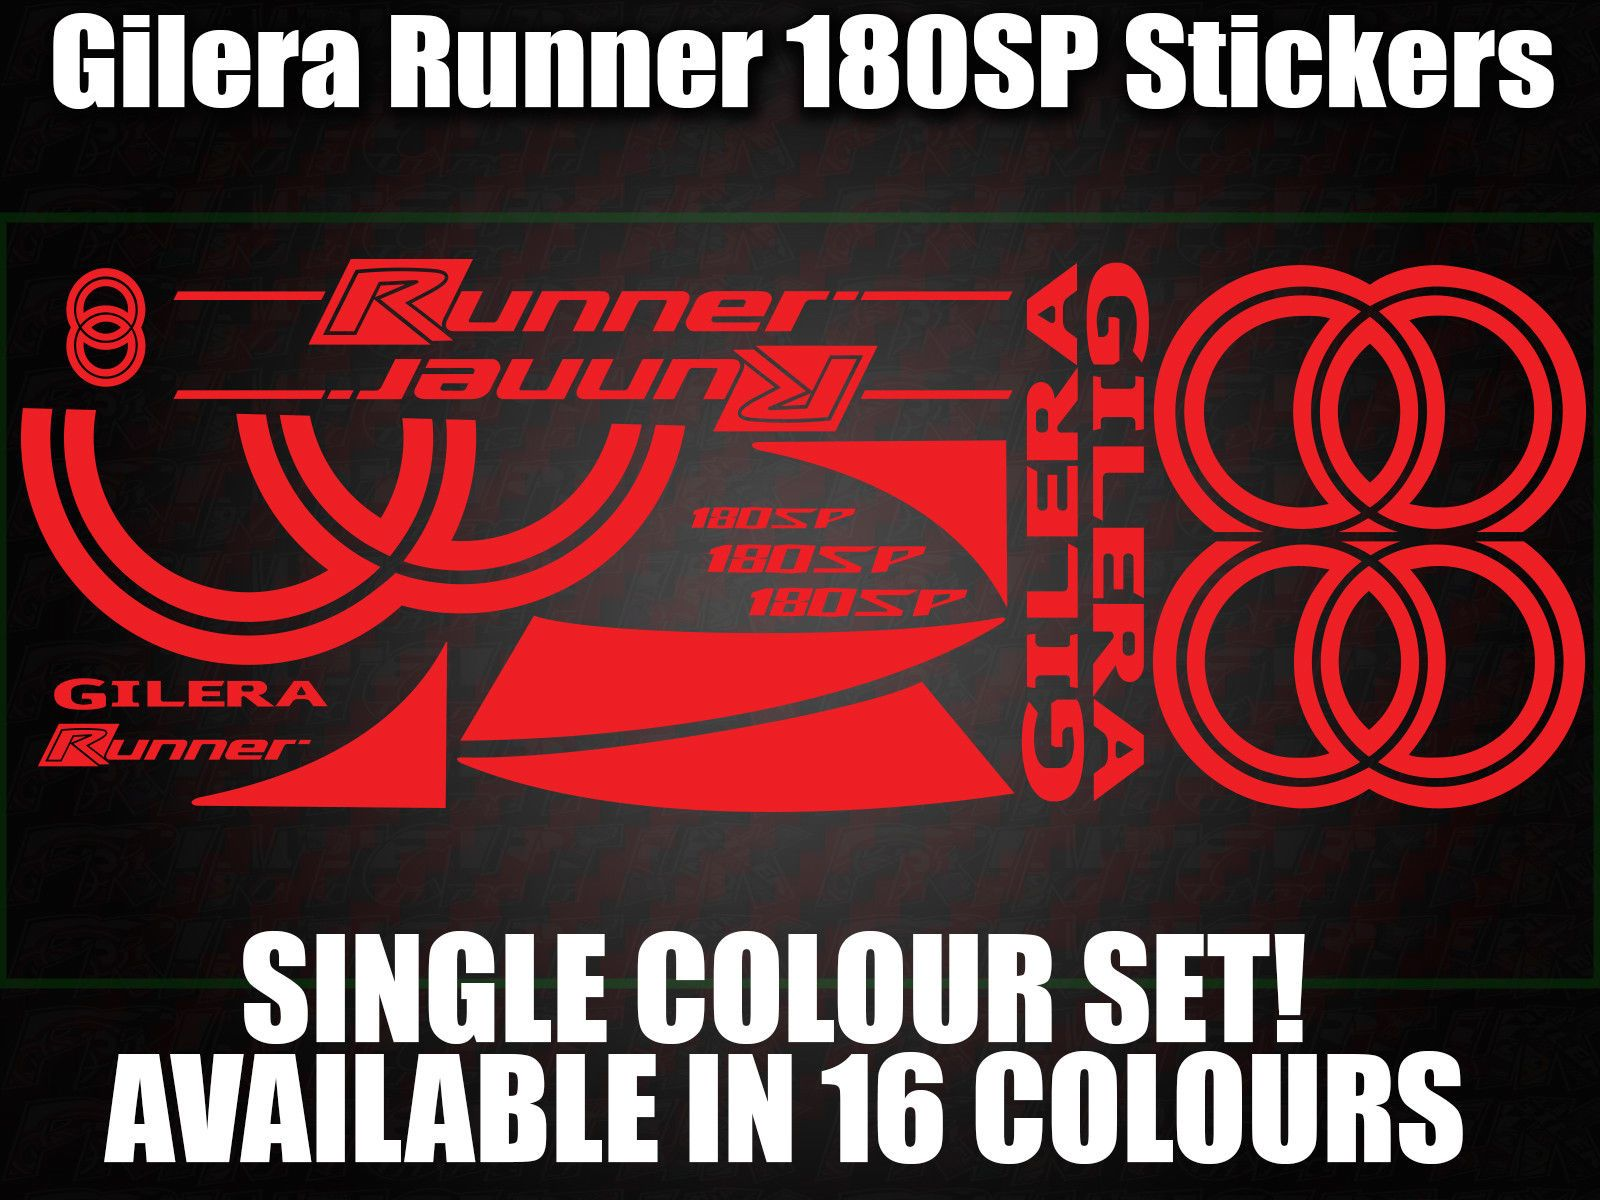 Gilera runner 180 sp large decals stickers 50 70 125 172 183 210